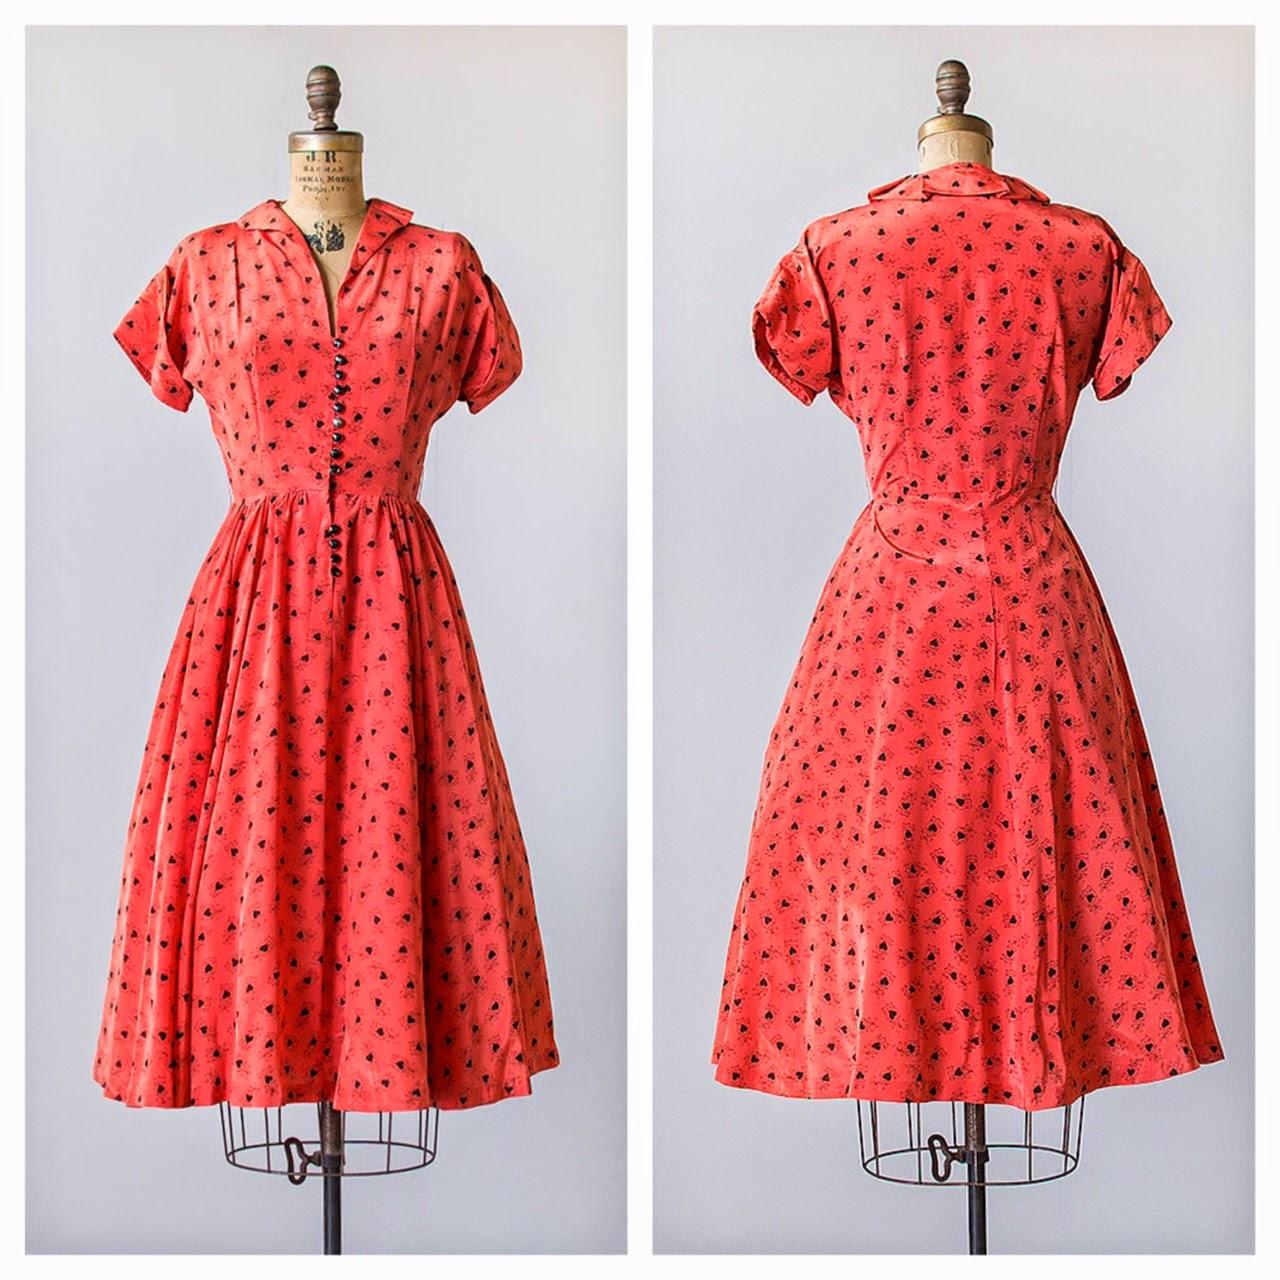 Adored Vintage Fashionable Floral Print